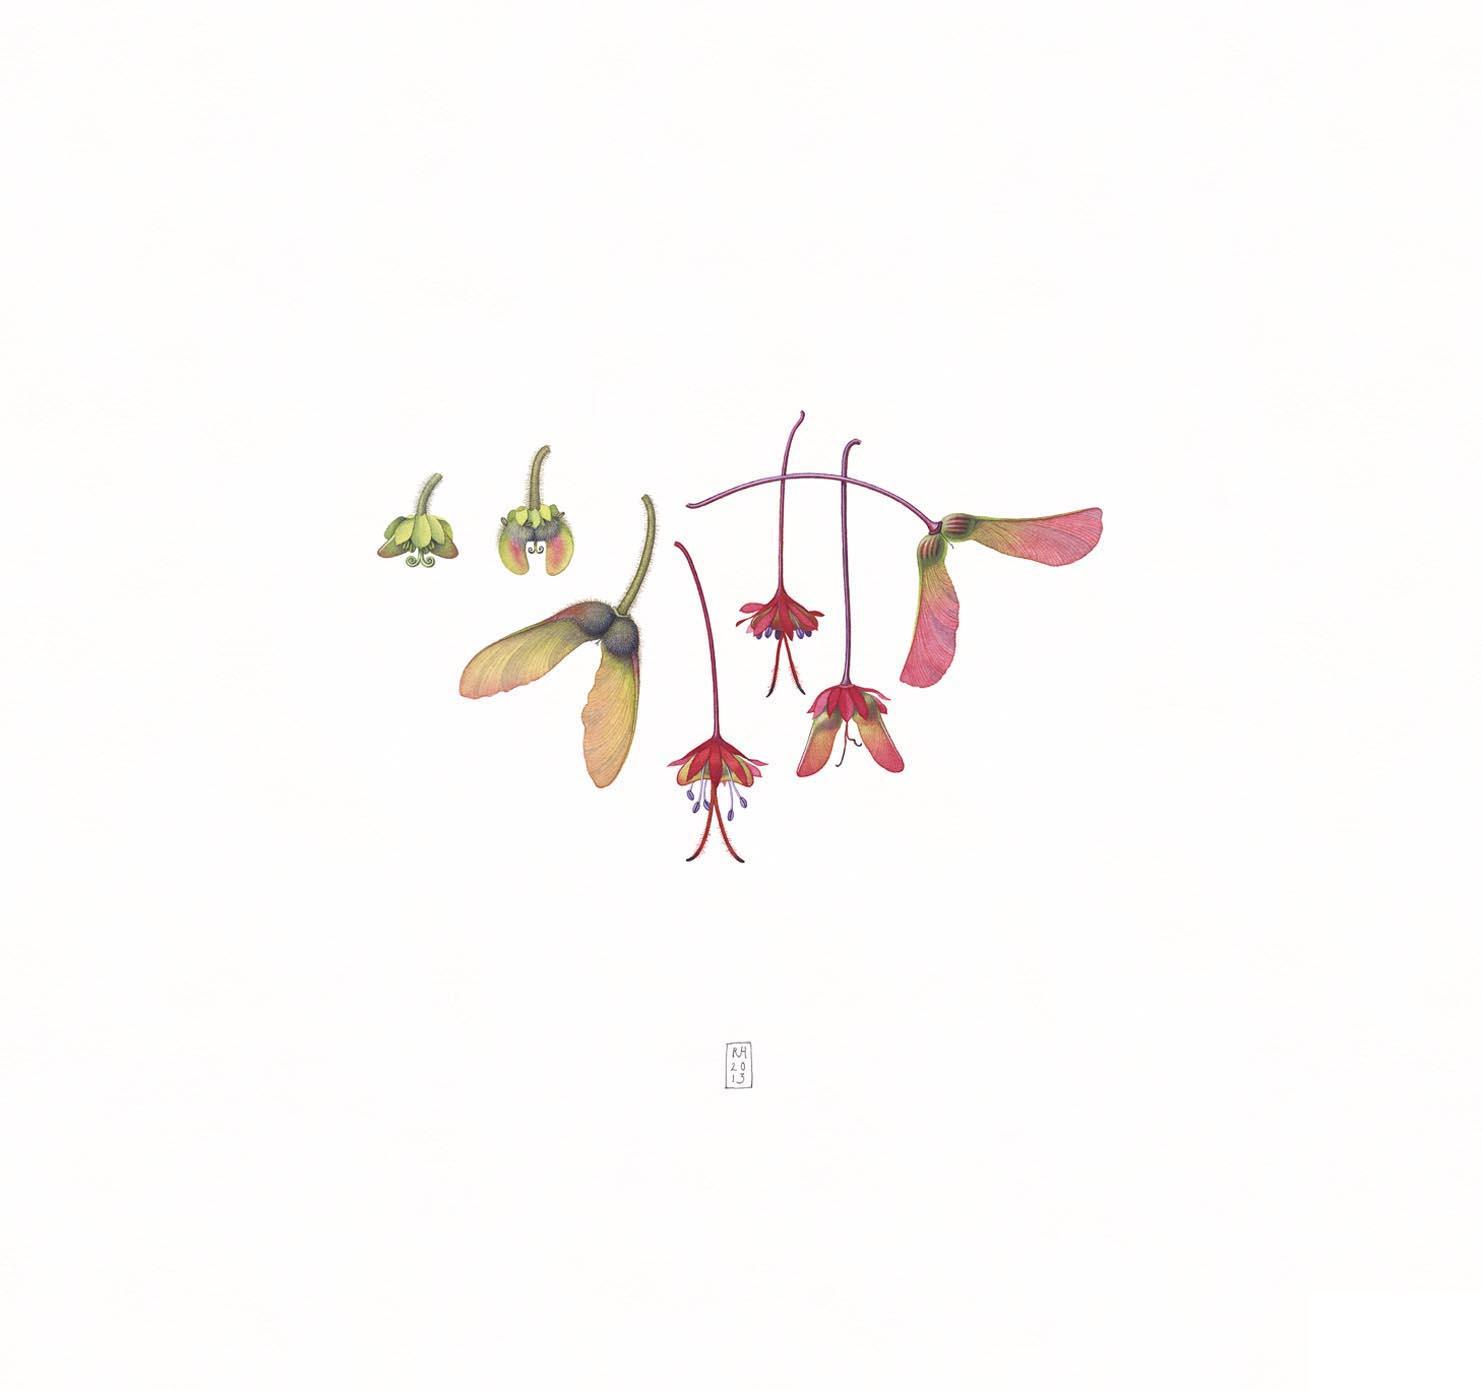 34. Acer triflorum - Acer rubrum